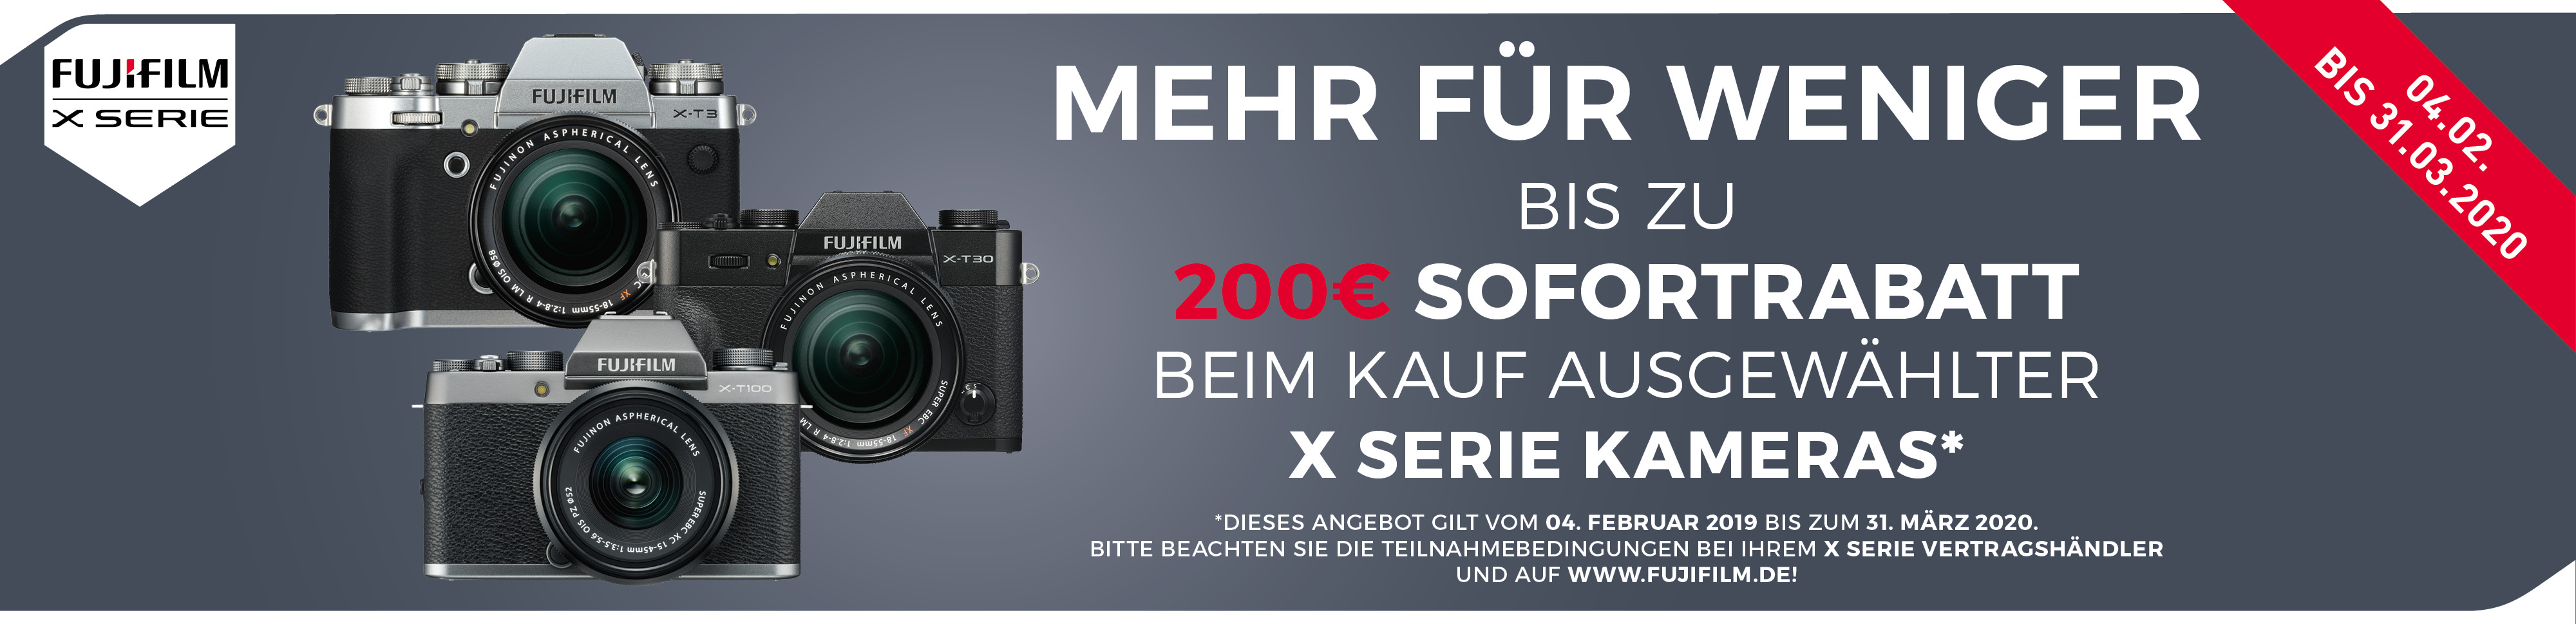 Fujifilm Sofortrabatt Aktion